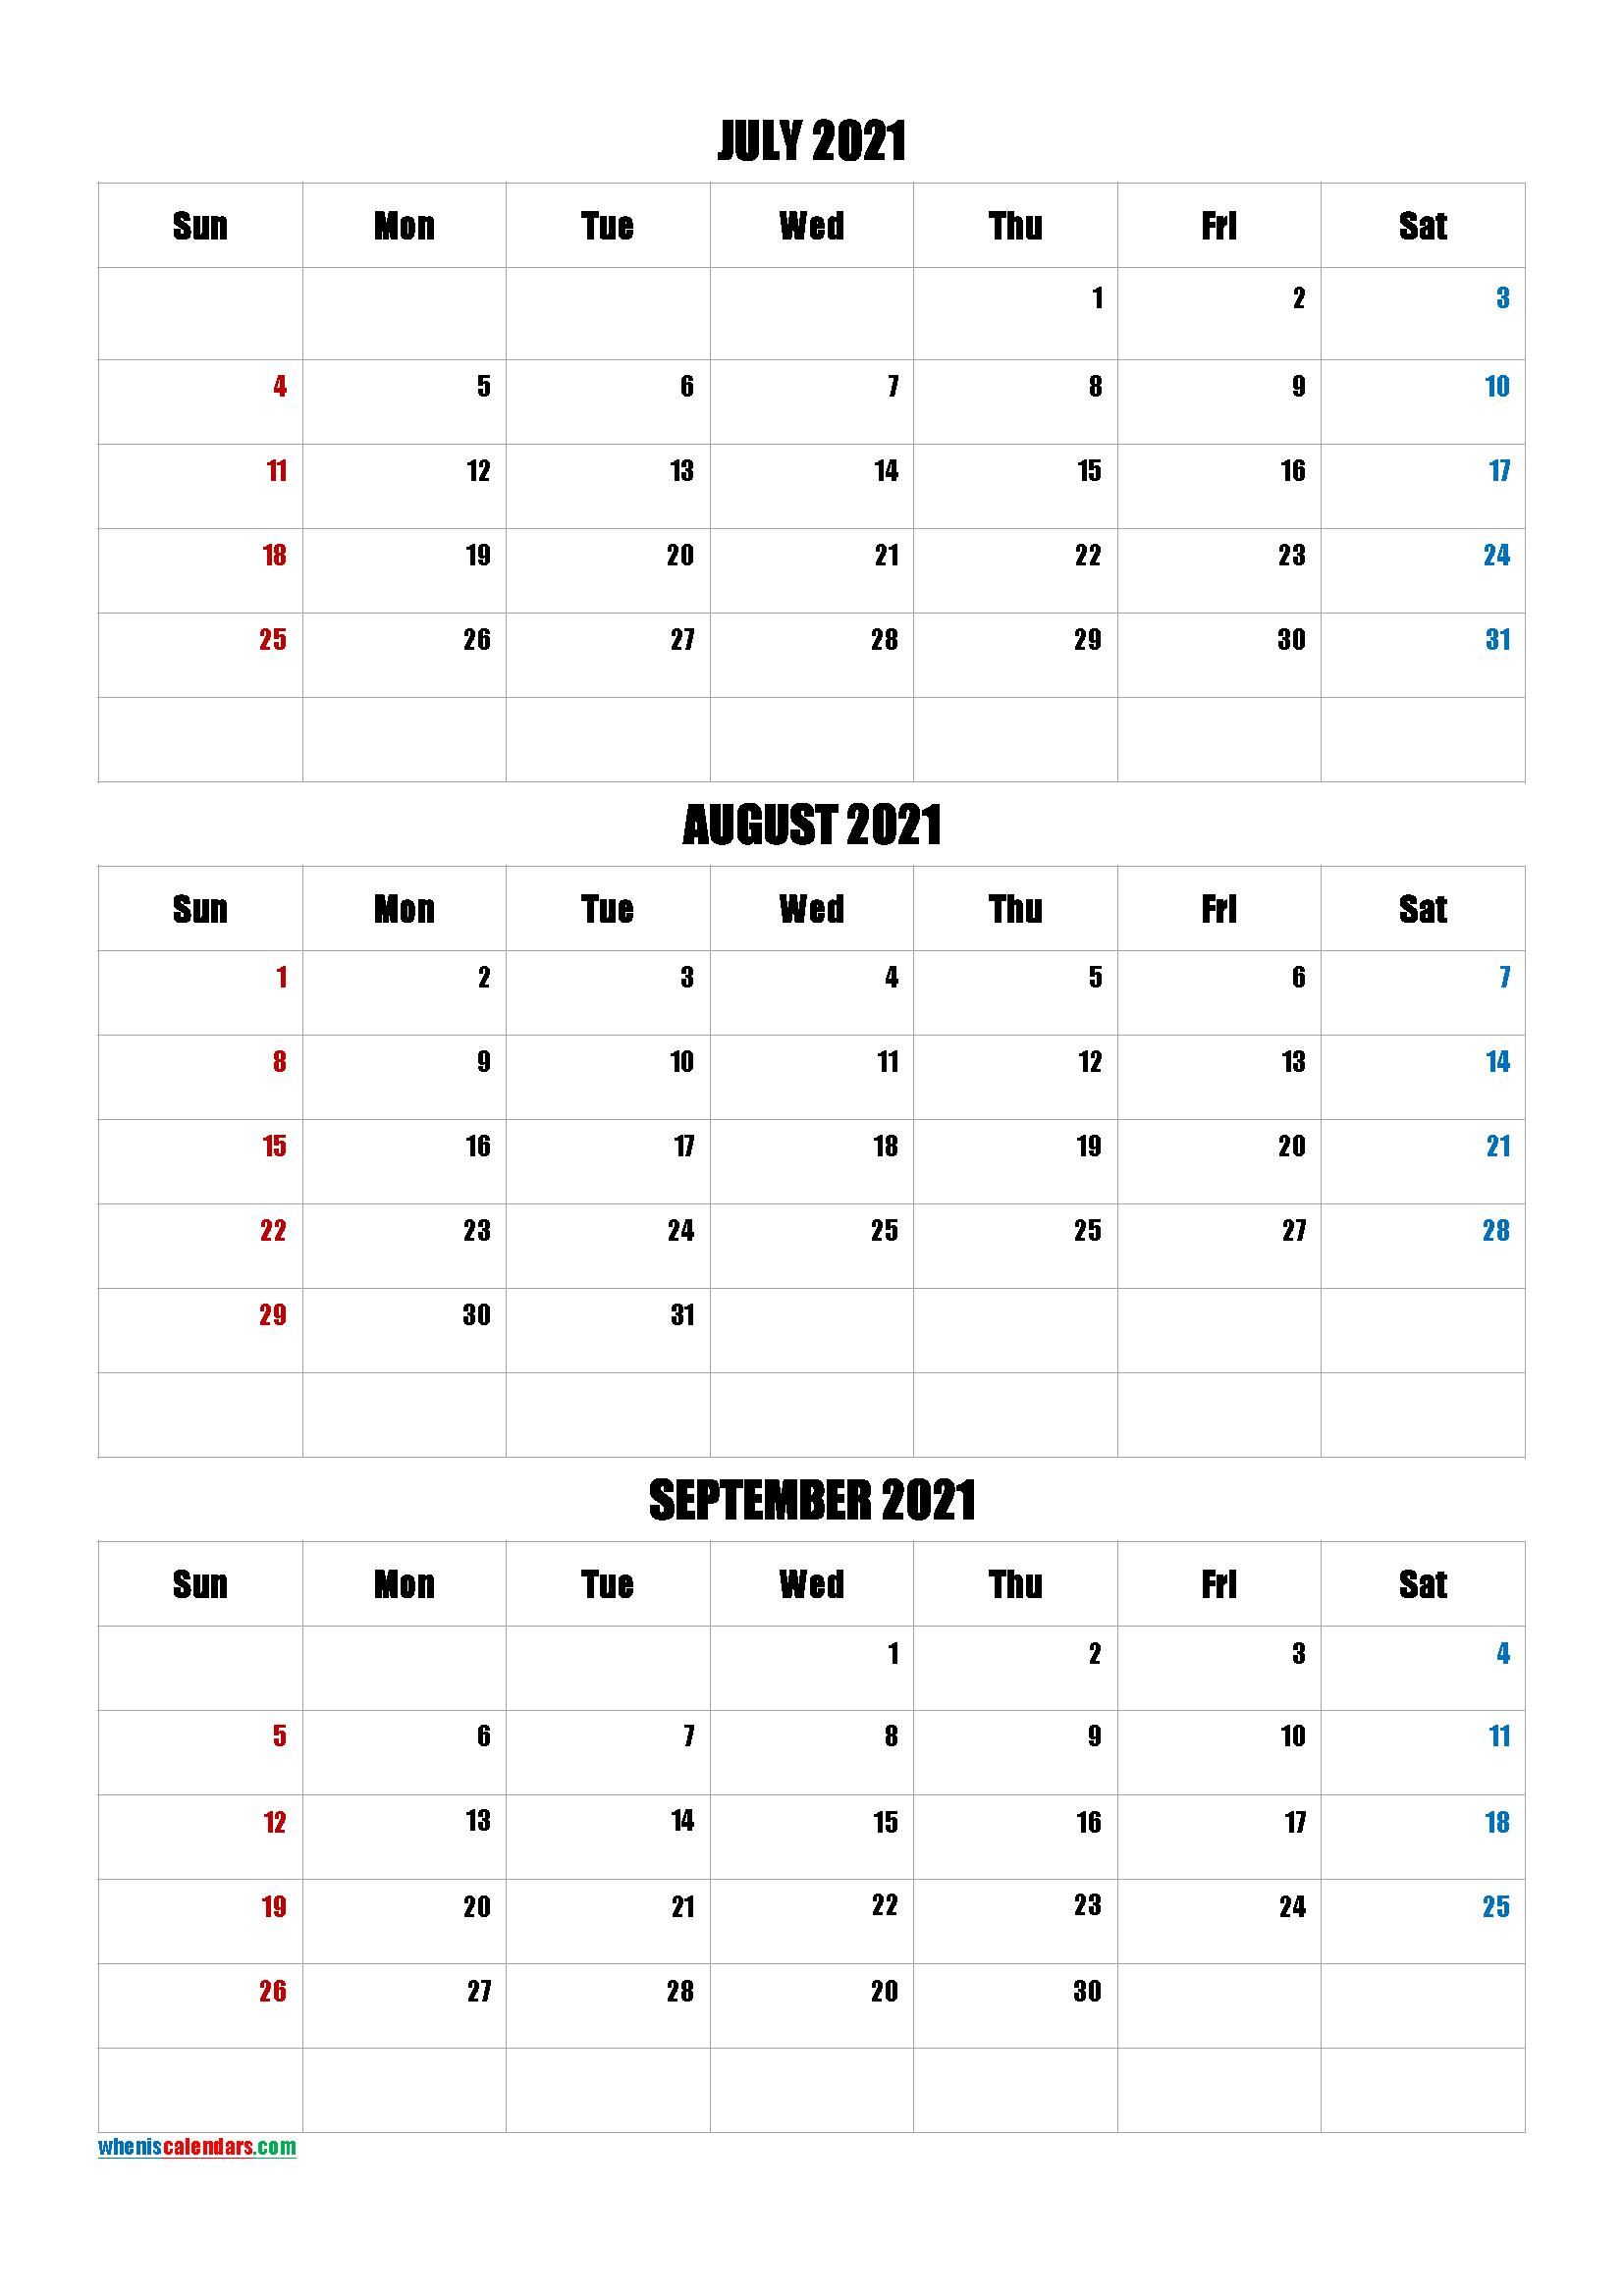 Free July August September 2021 Calendar